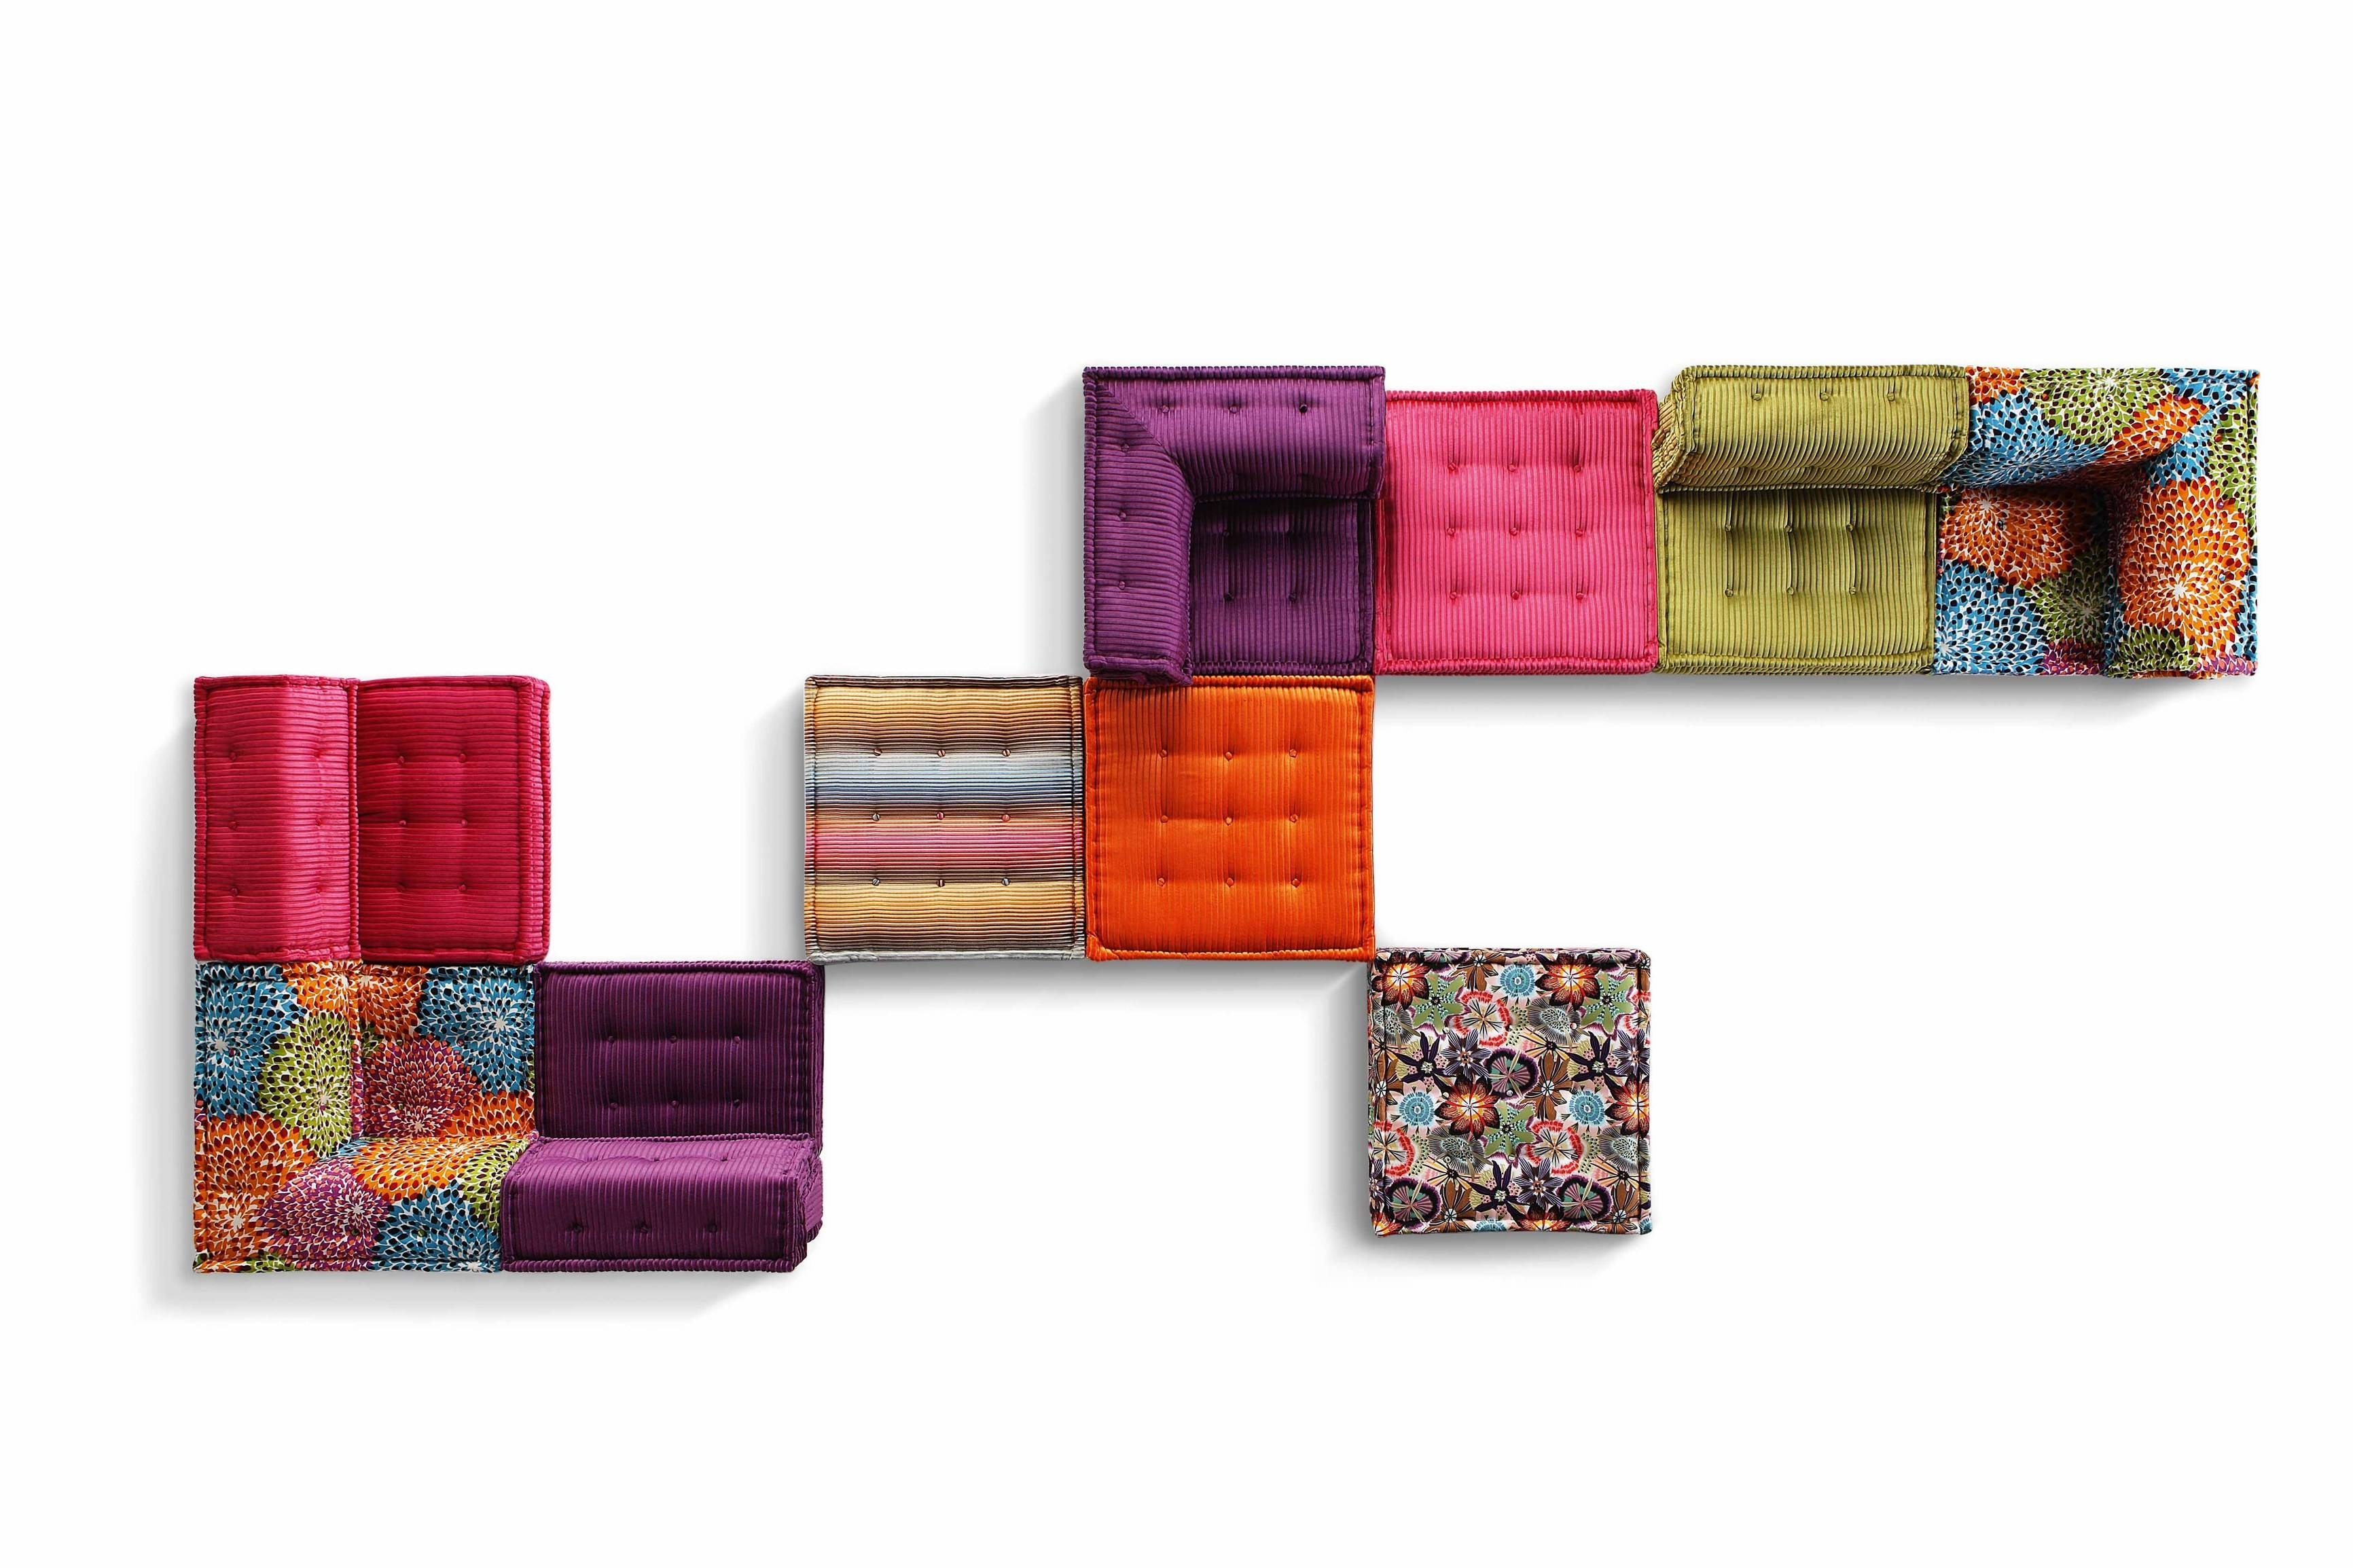 Sectional Fabric Sofa Mah Jong Missoni Homeroche Bobois Design within Roche Bobois Mah Jong Sofas (Image 14 of 15)